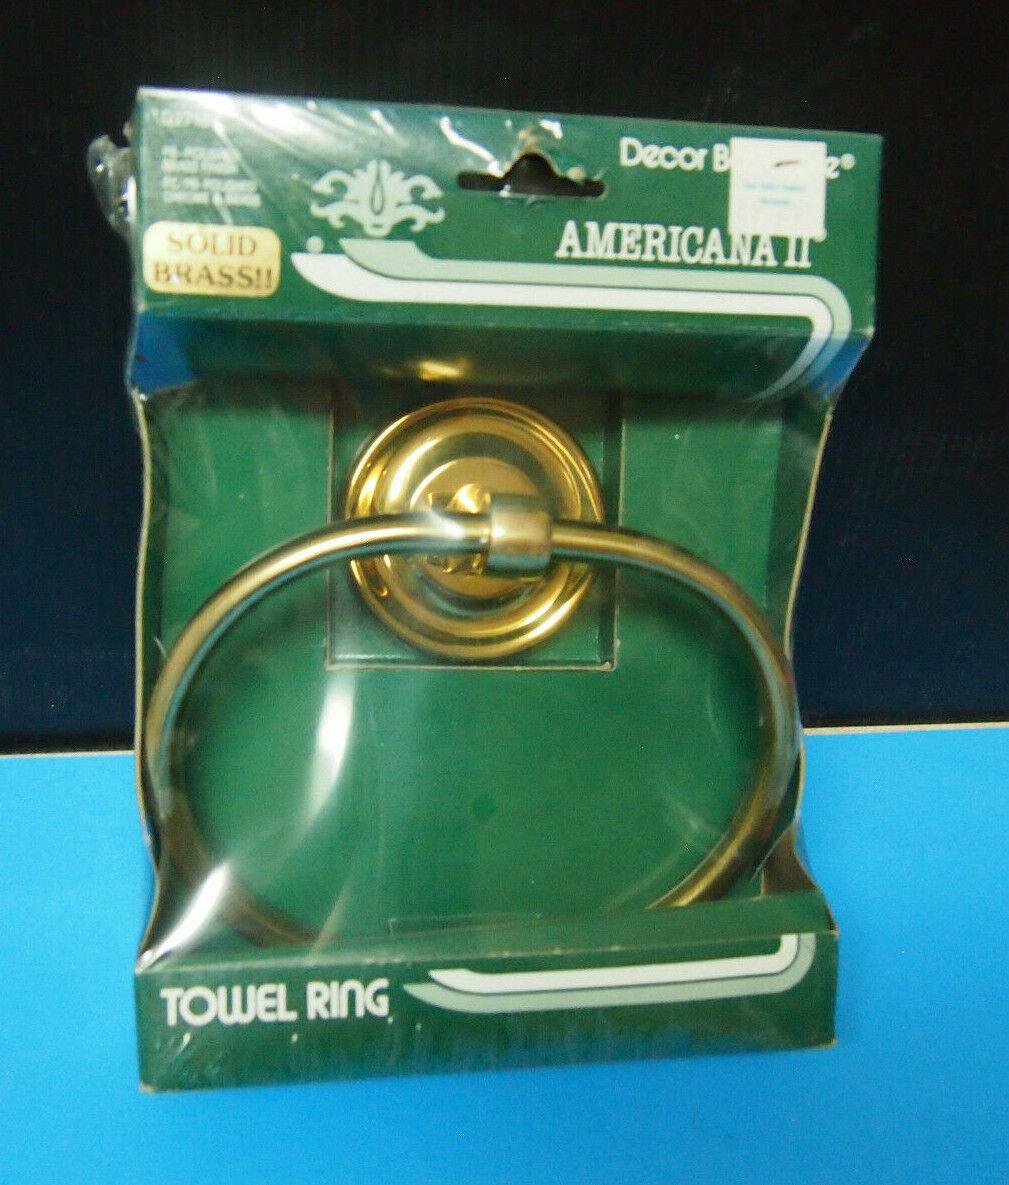 Decora Bathware Solid Brass Towel Holder High Polished NOS Heavy